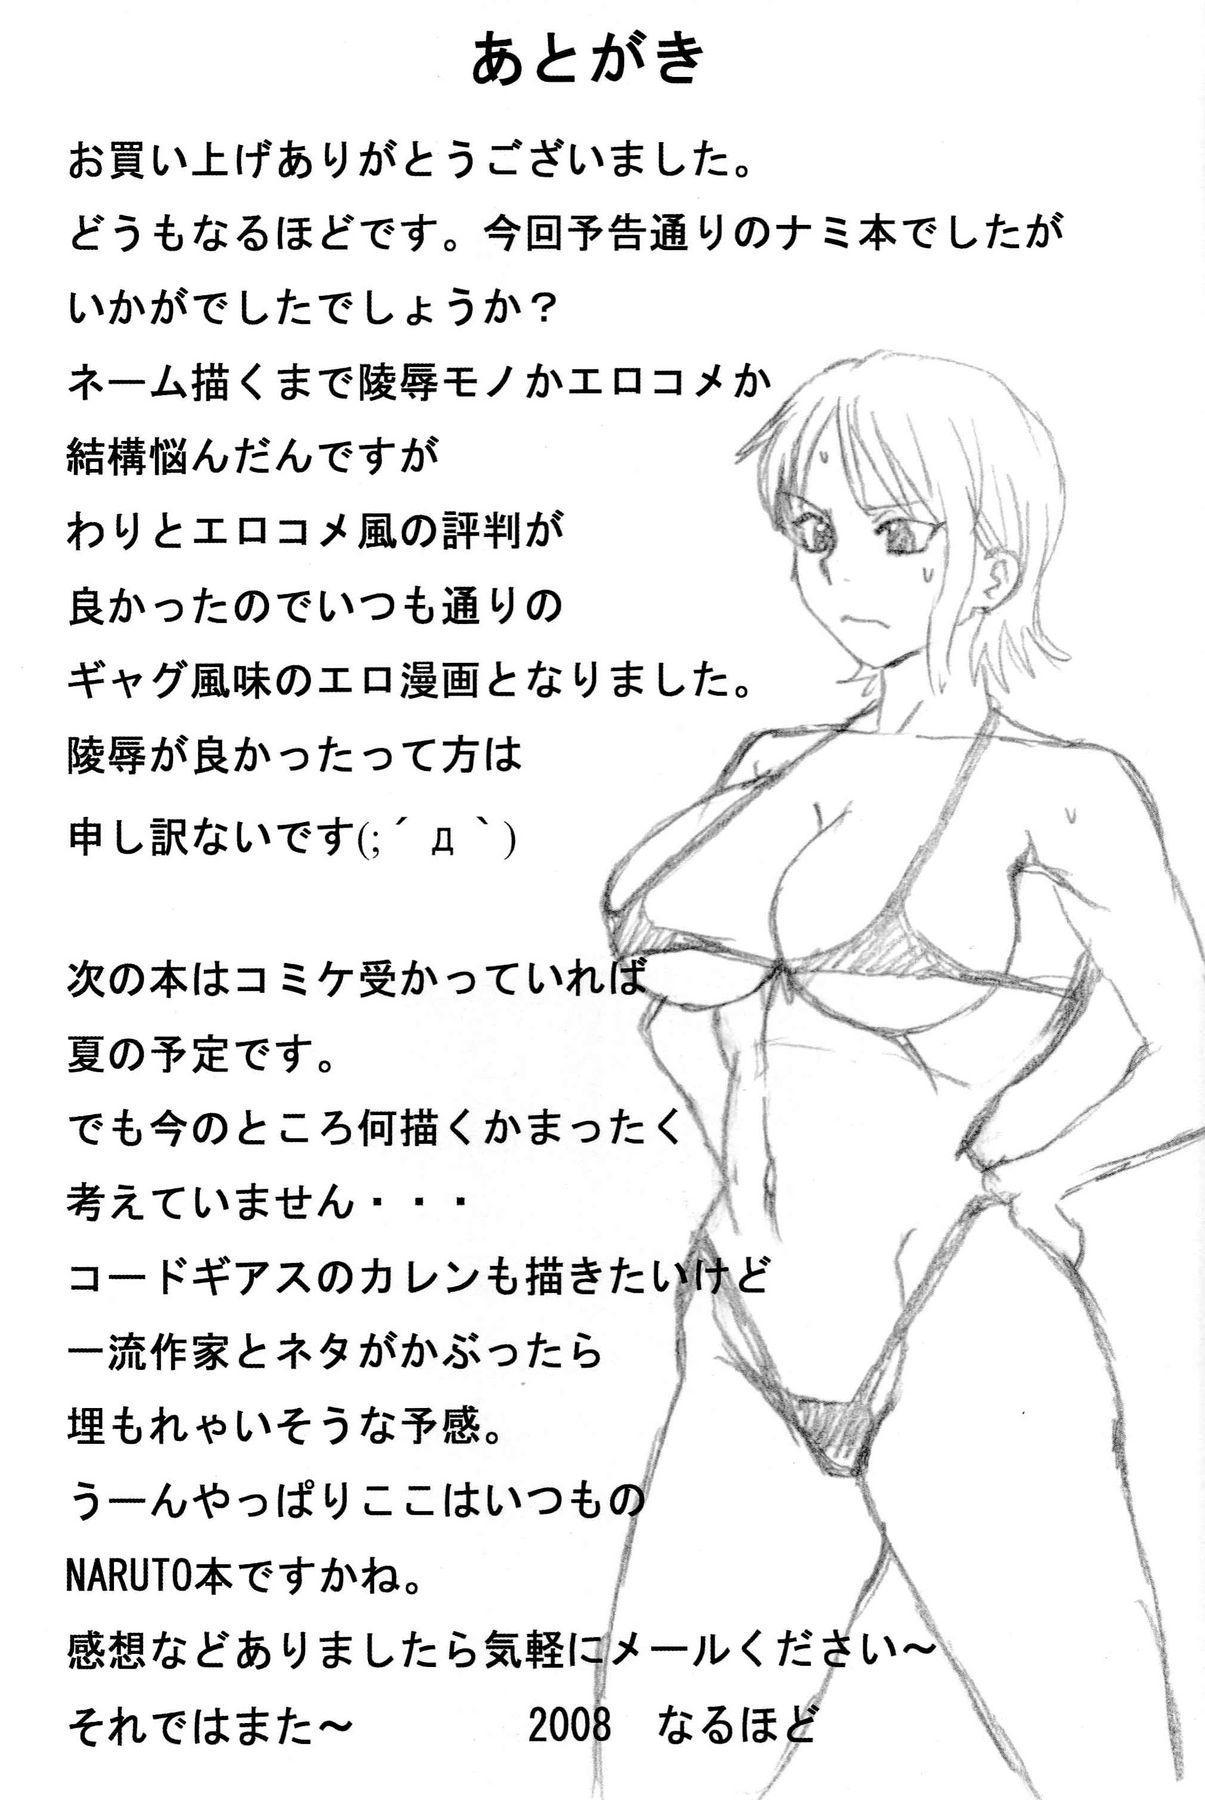 Ii Nami Yume Kibun | Good Nami Dream Feeling 39